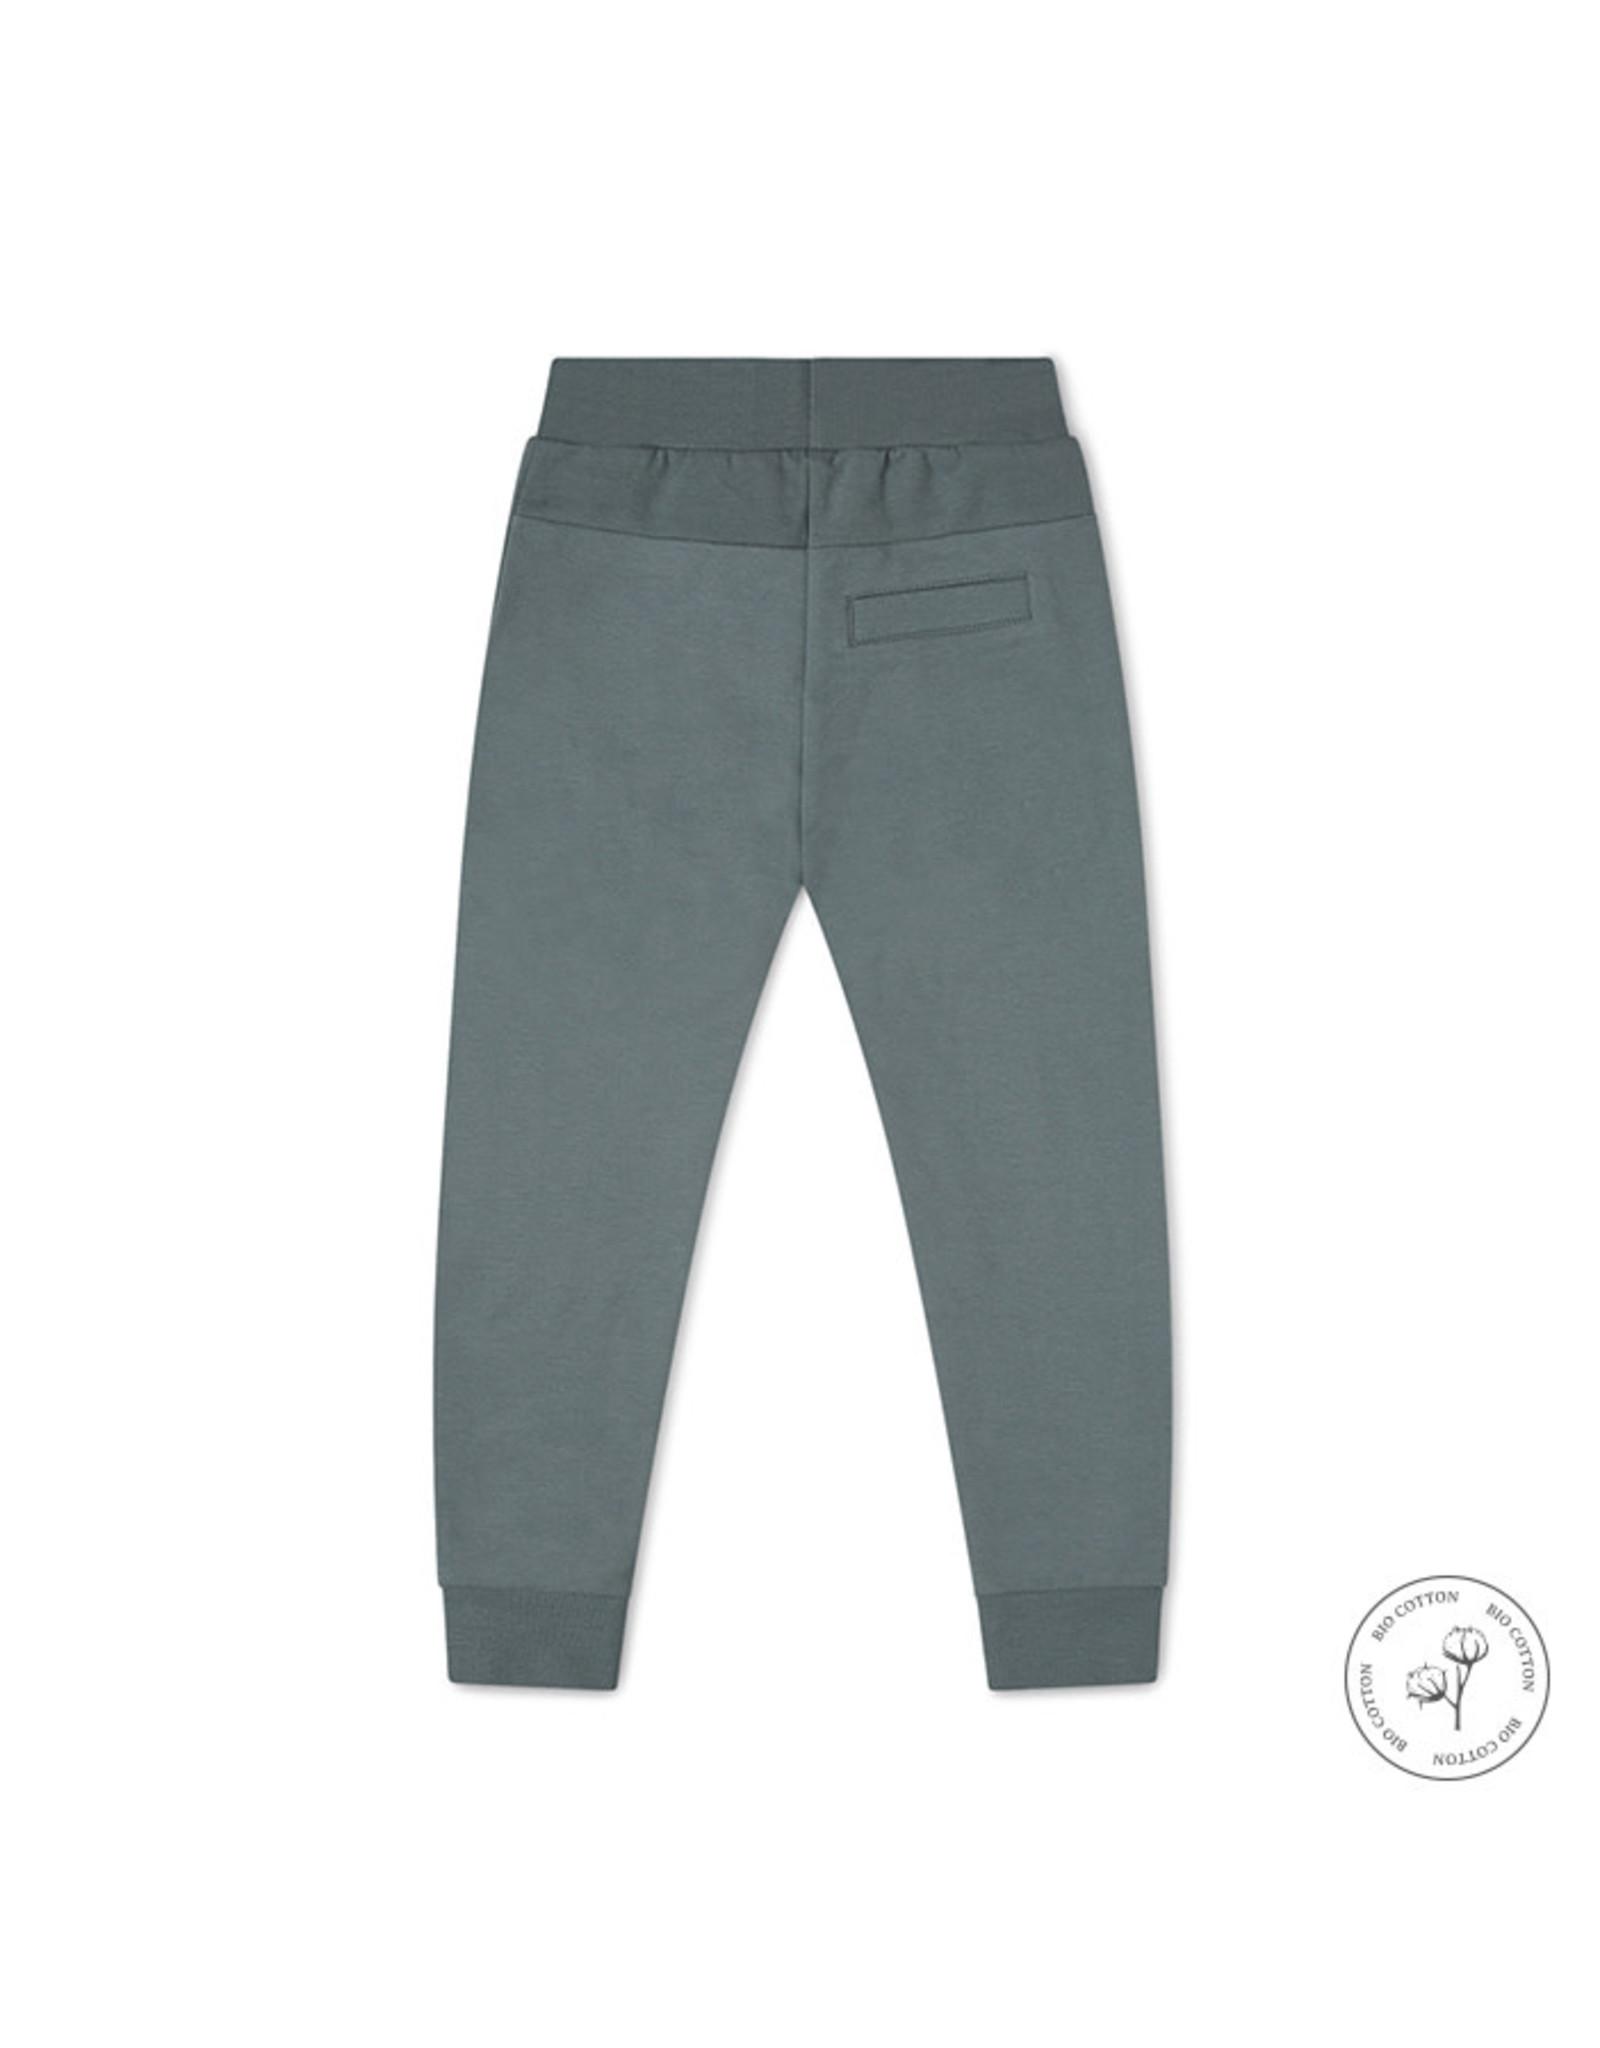 Koko Noko Boys Nick jogging trousers Bio Cotton Faded green NOS